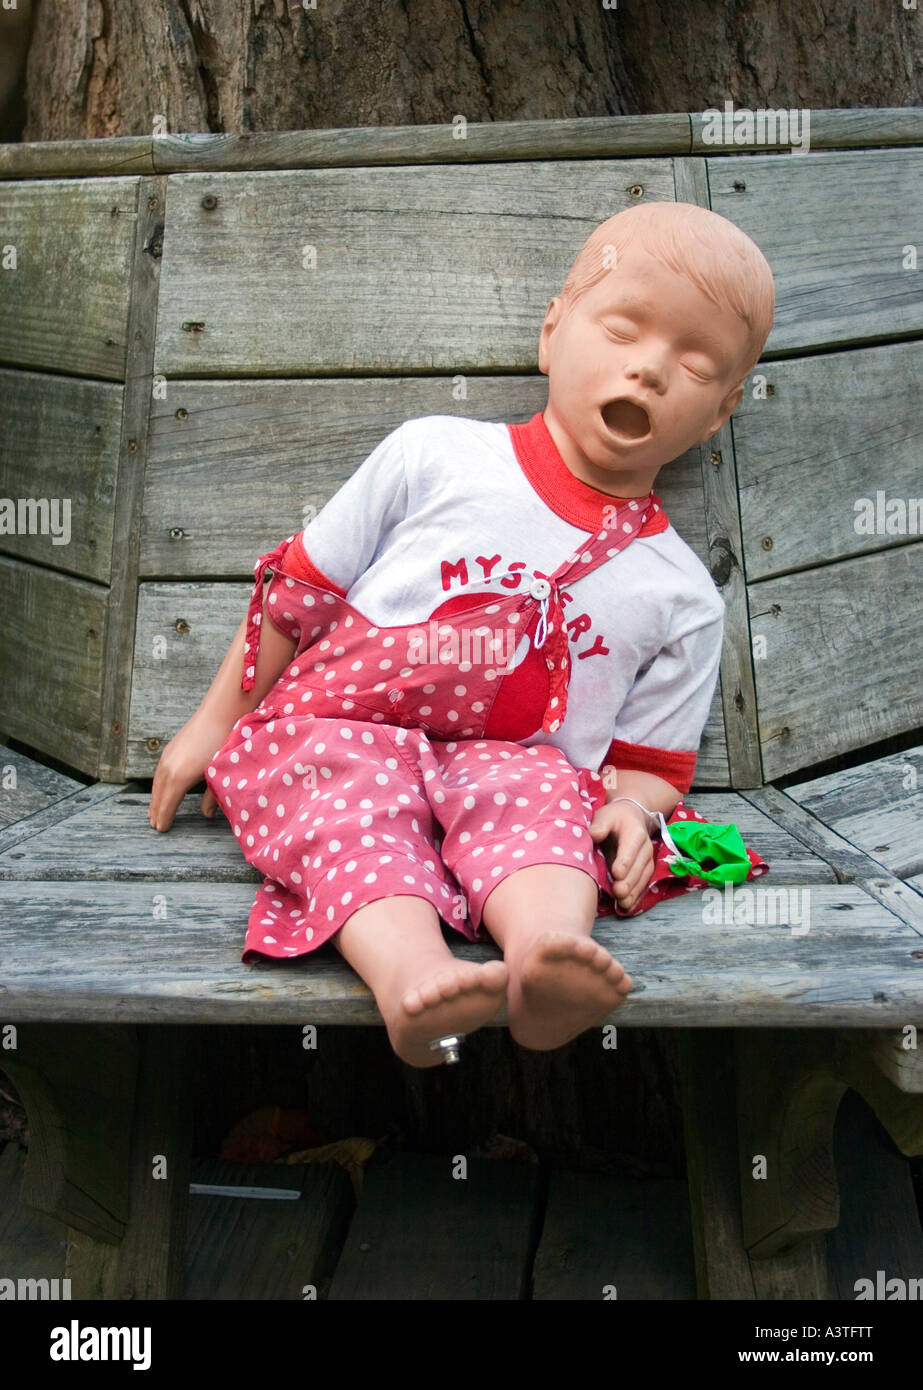 Boy Blow Up Doll